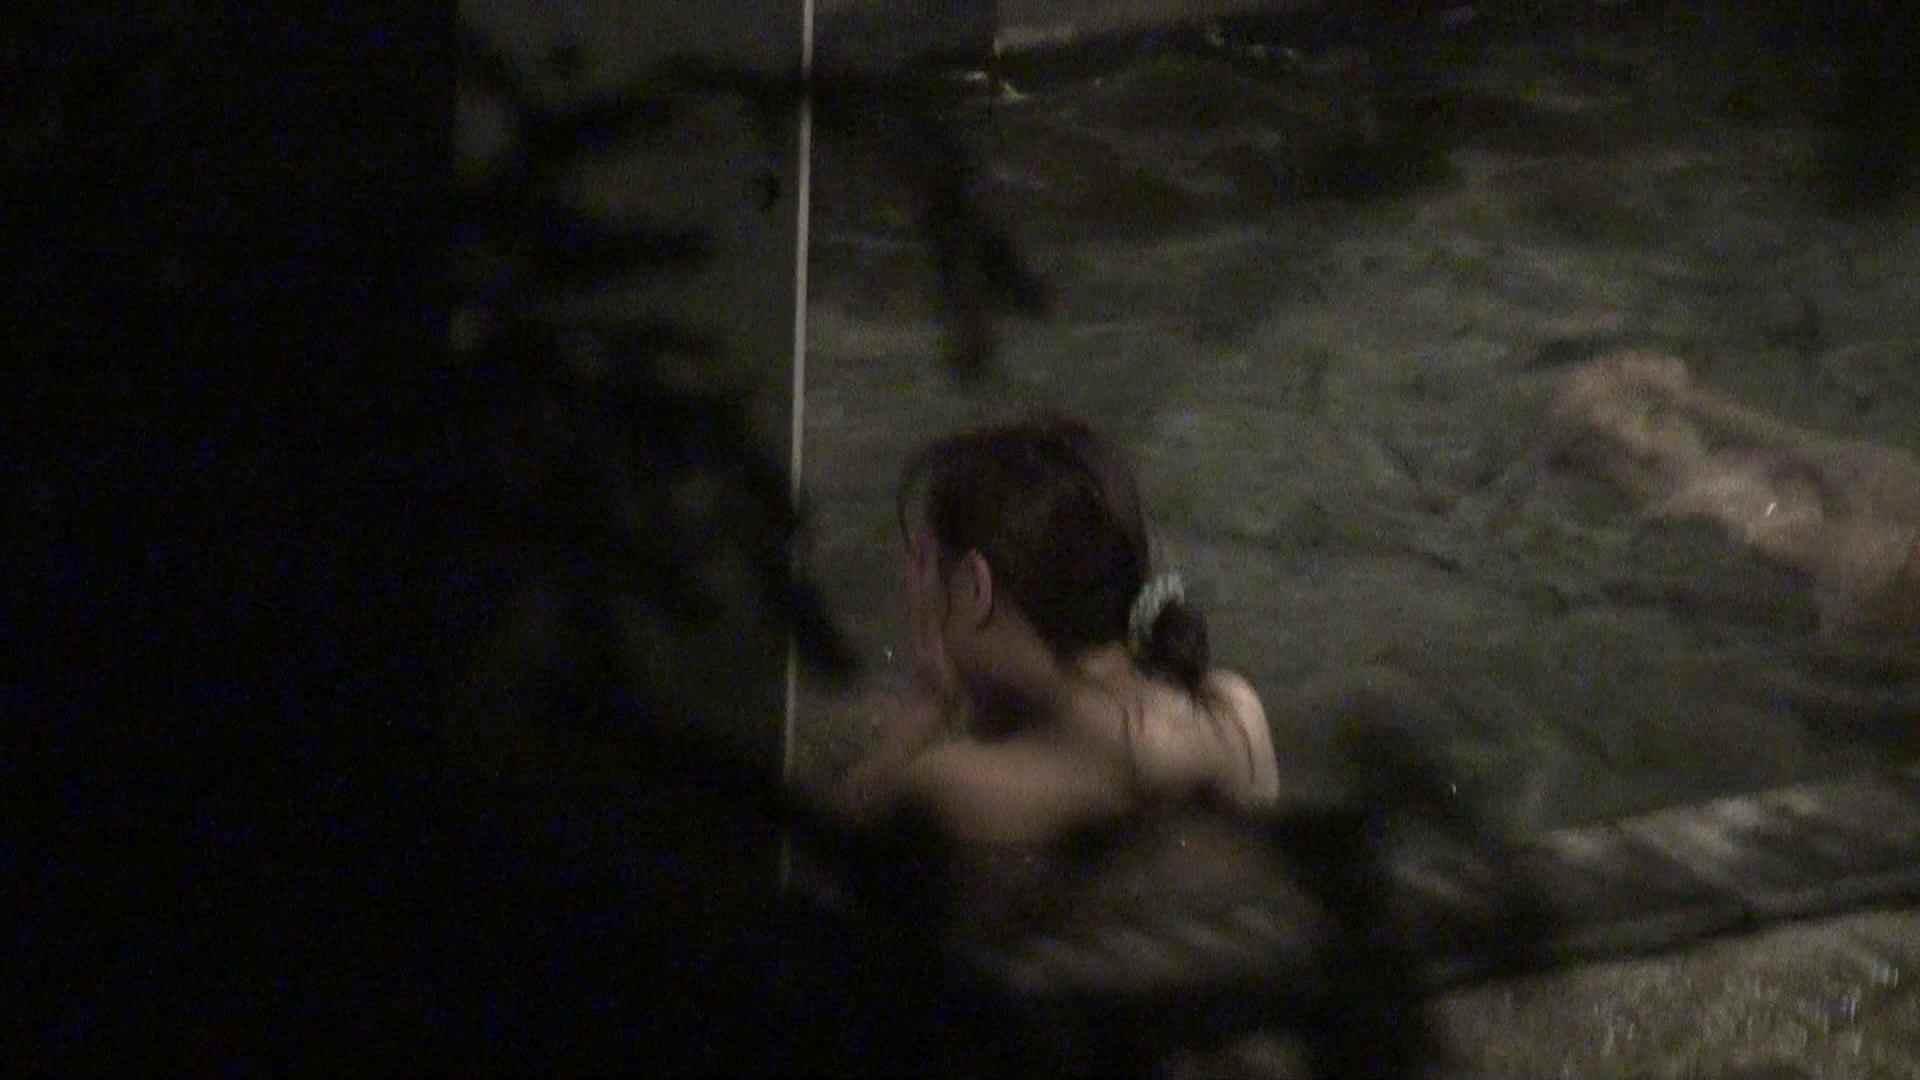 Aquaな露天風呂Vol.438 女体盗撮 盗撮オメコ無修正動画無料 76連発 17